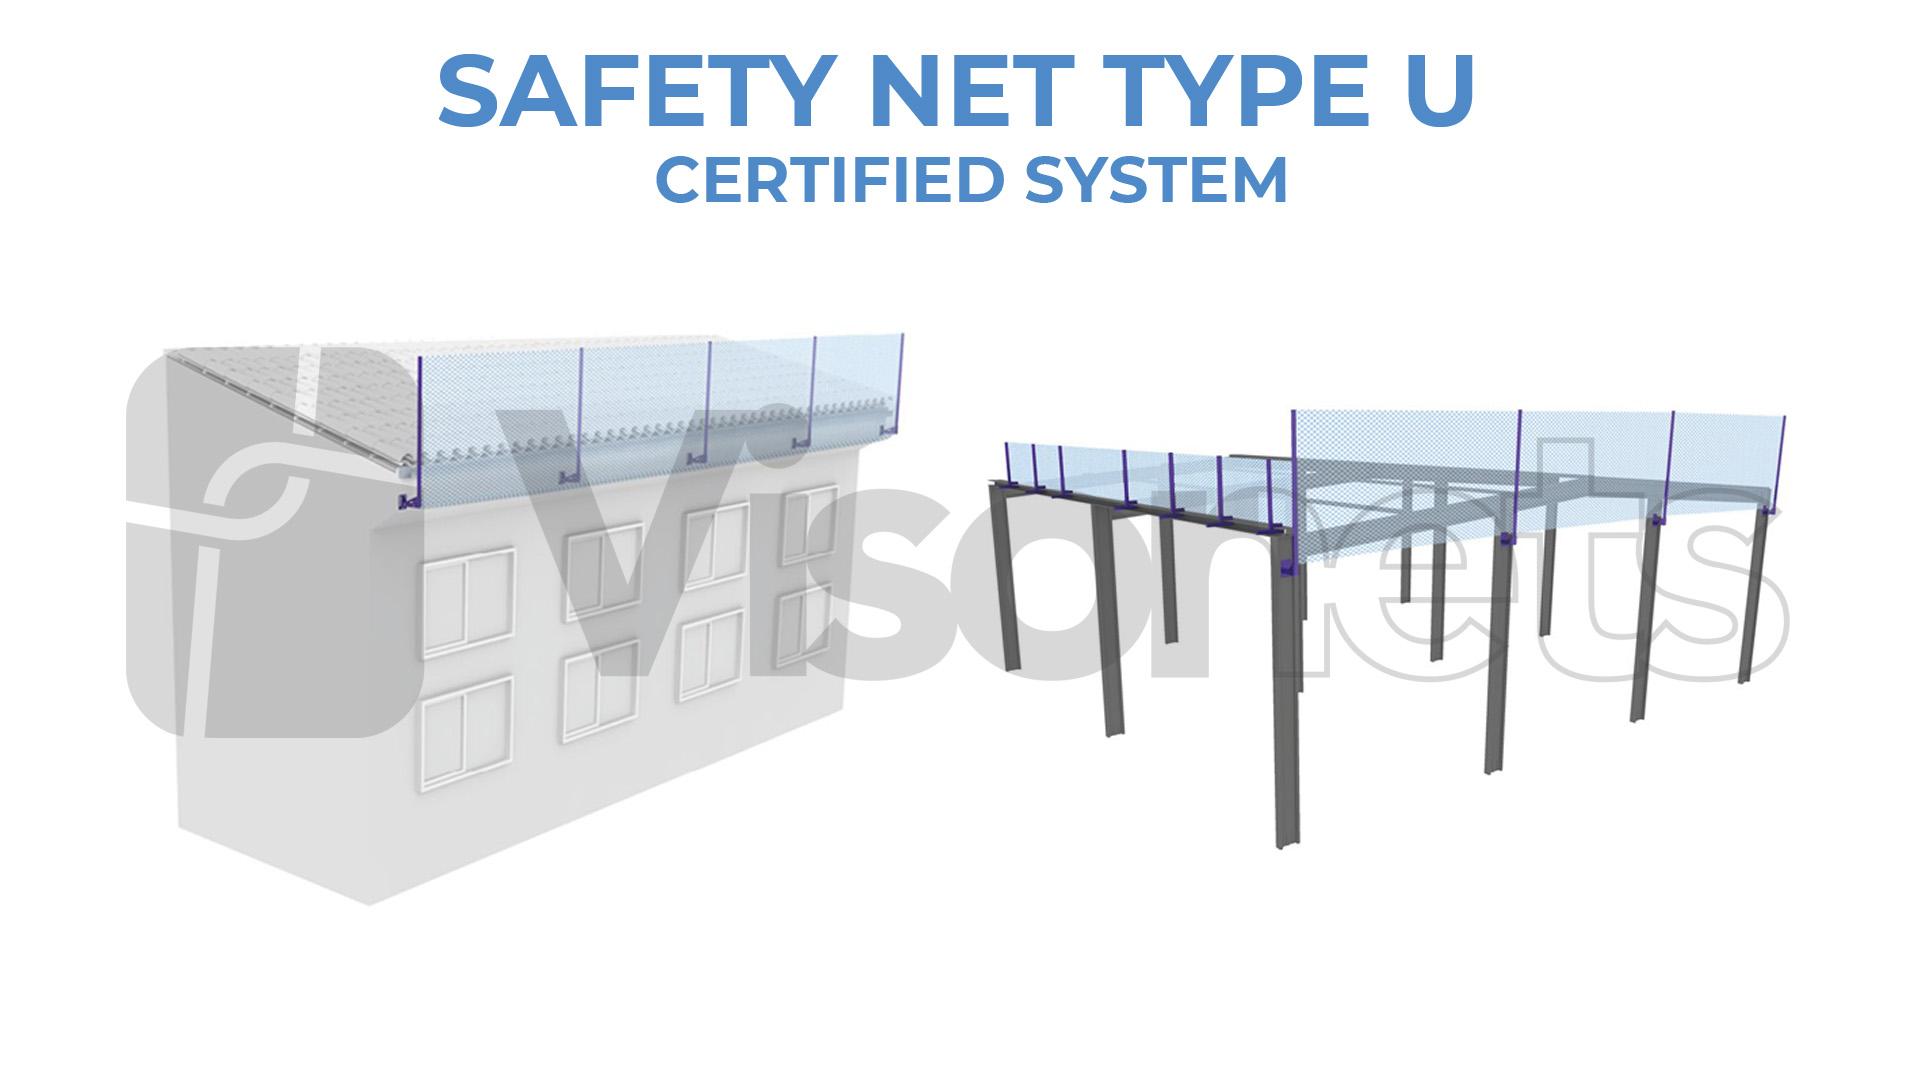 safety net type U by visornets